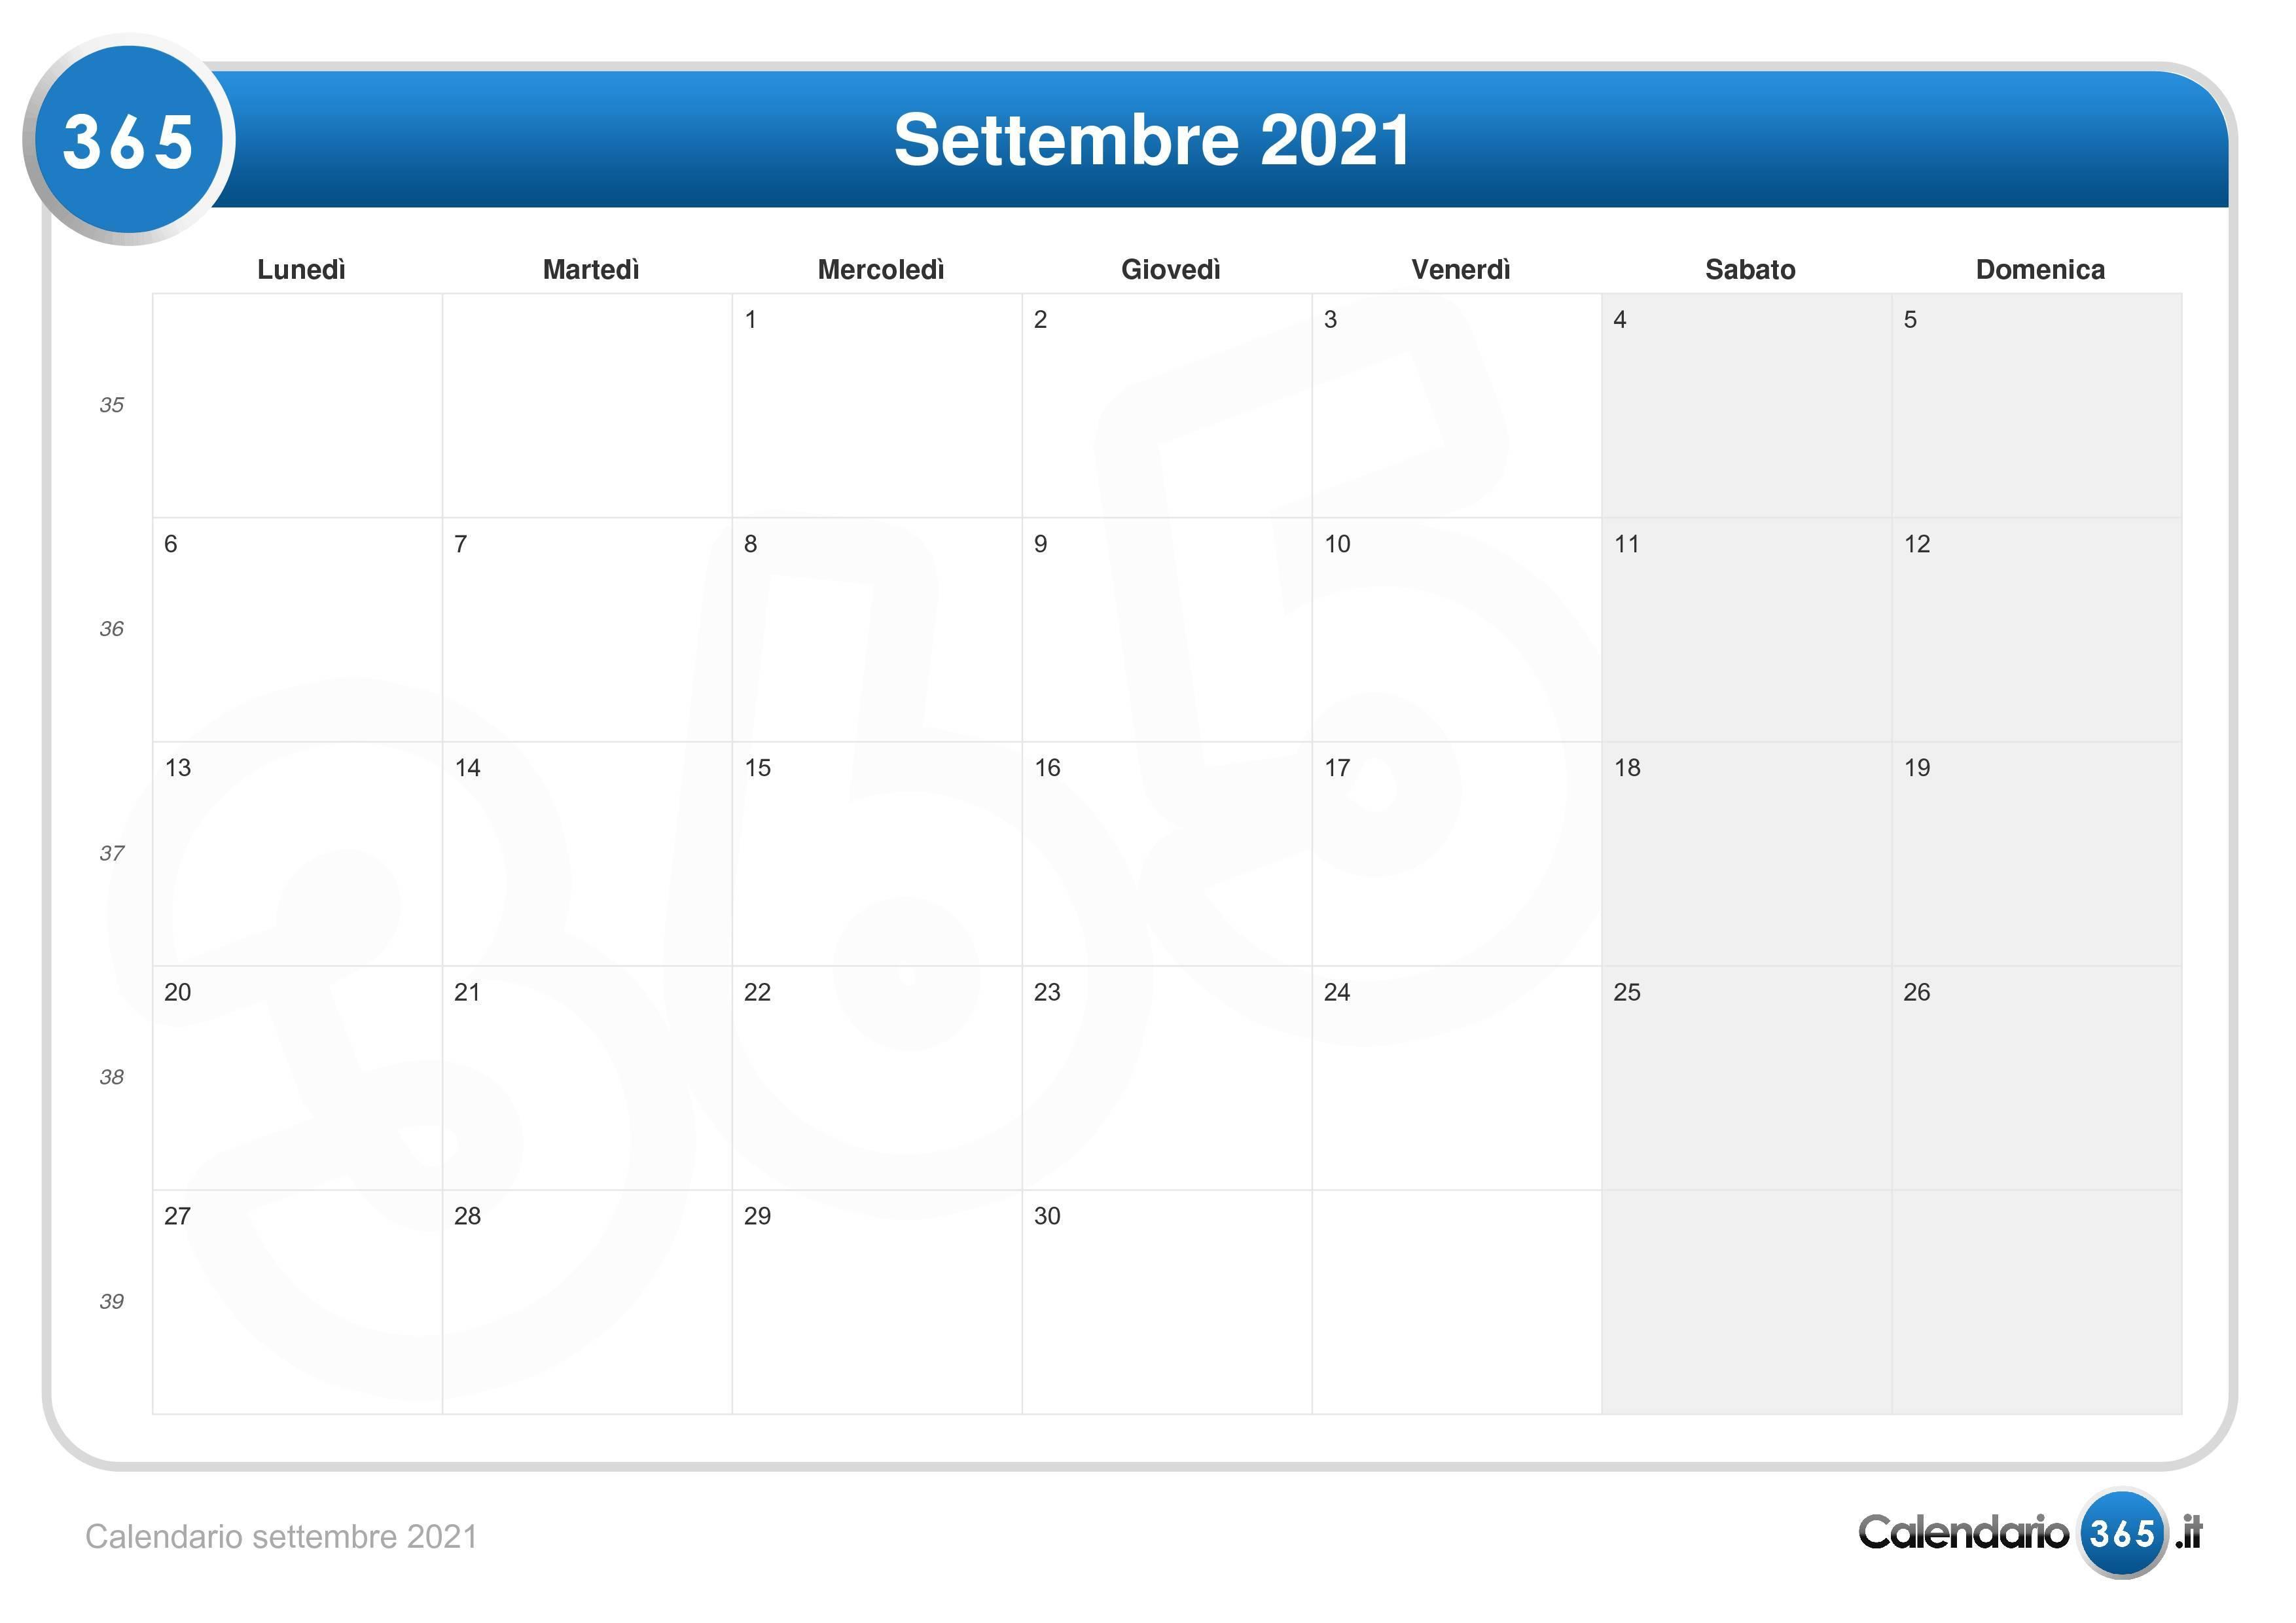 Calendario settembre 2021